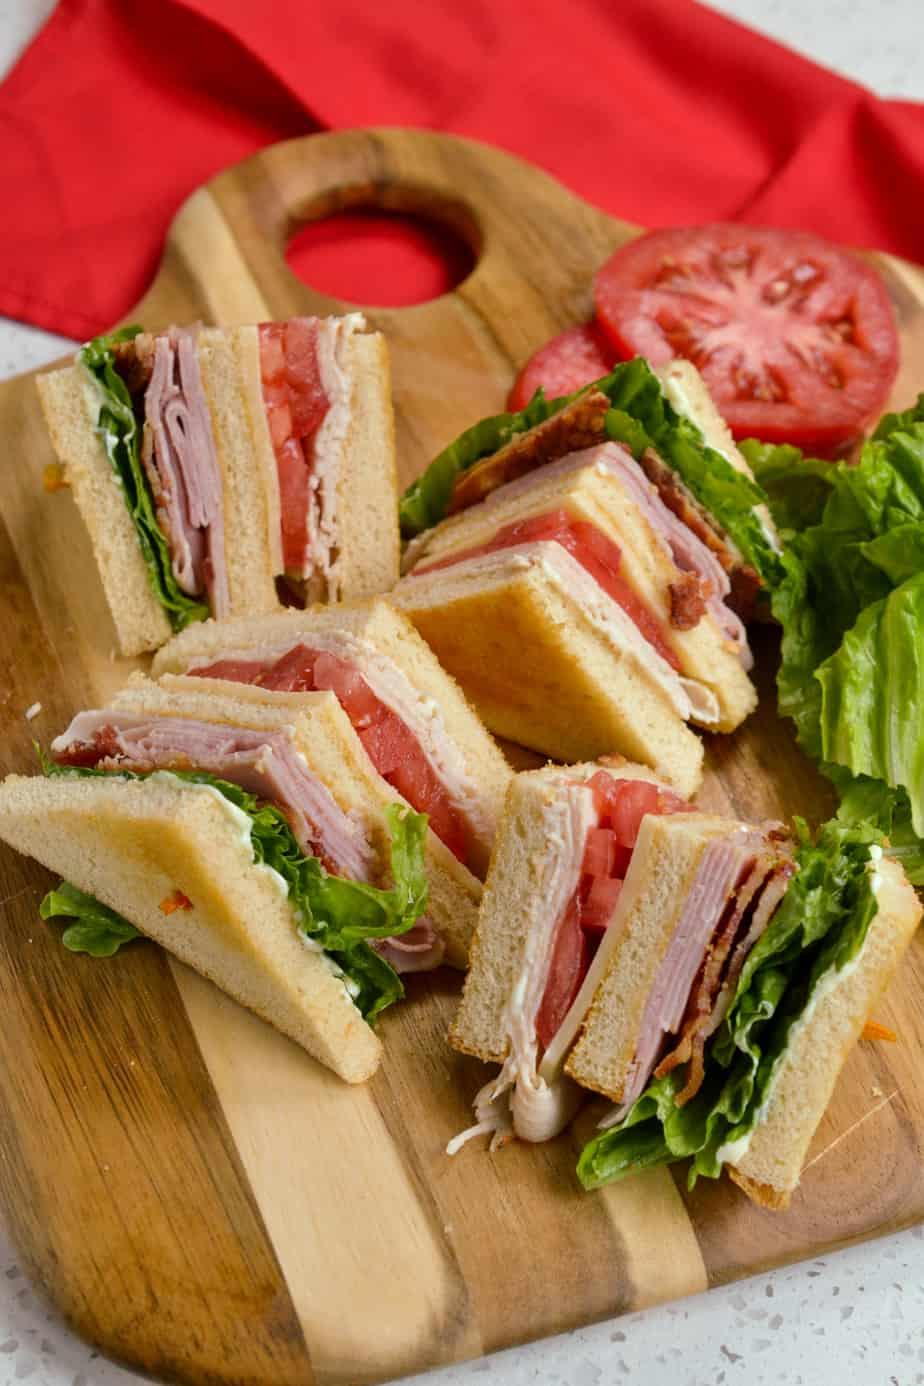 A classic club sandwich quartered on a cutting board.